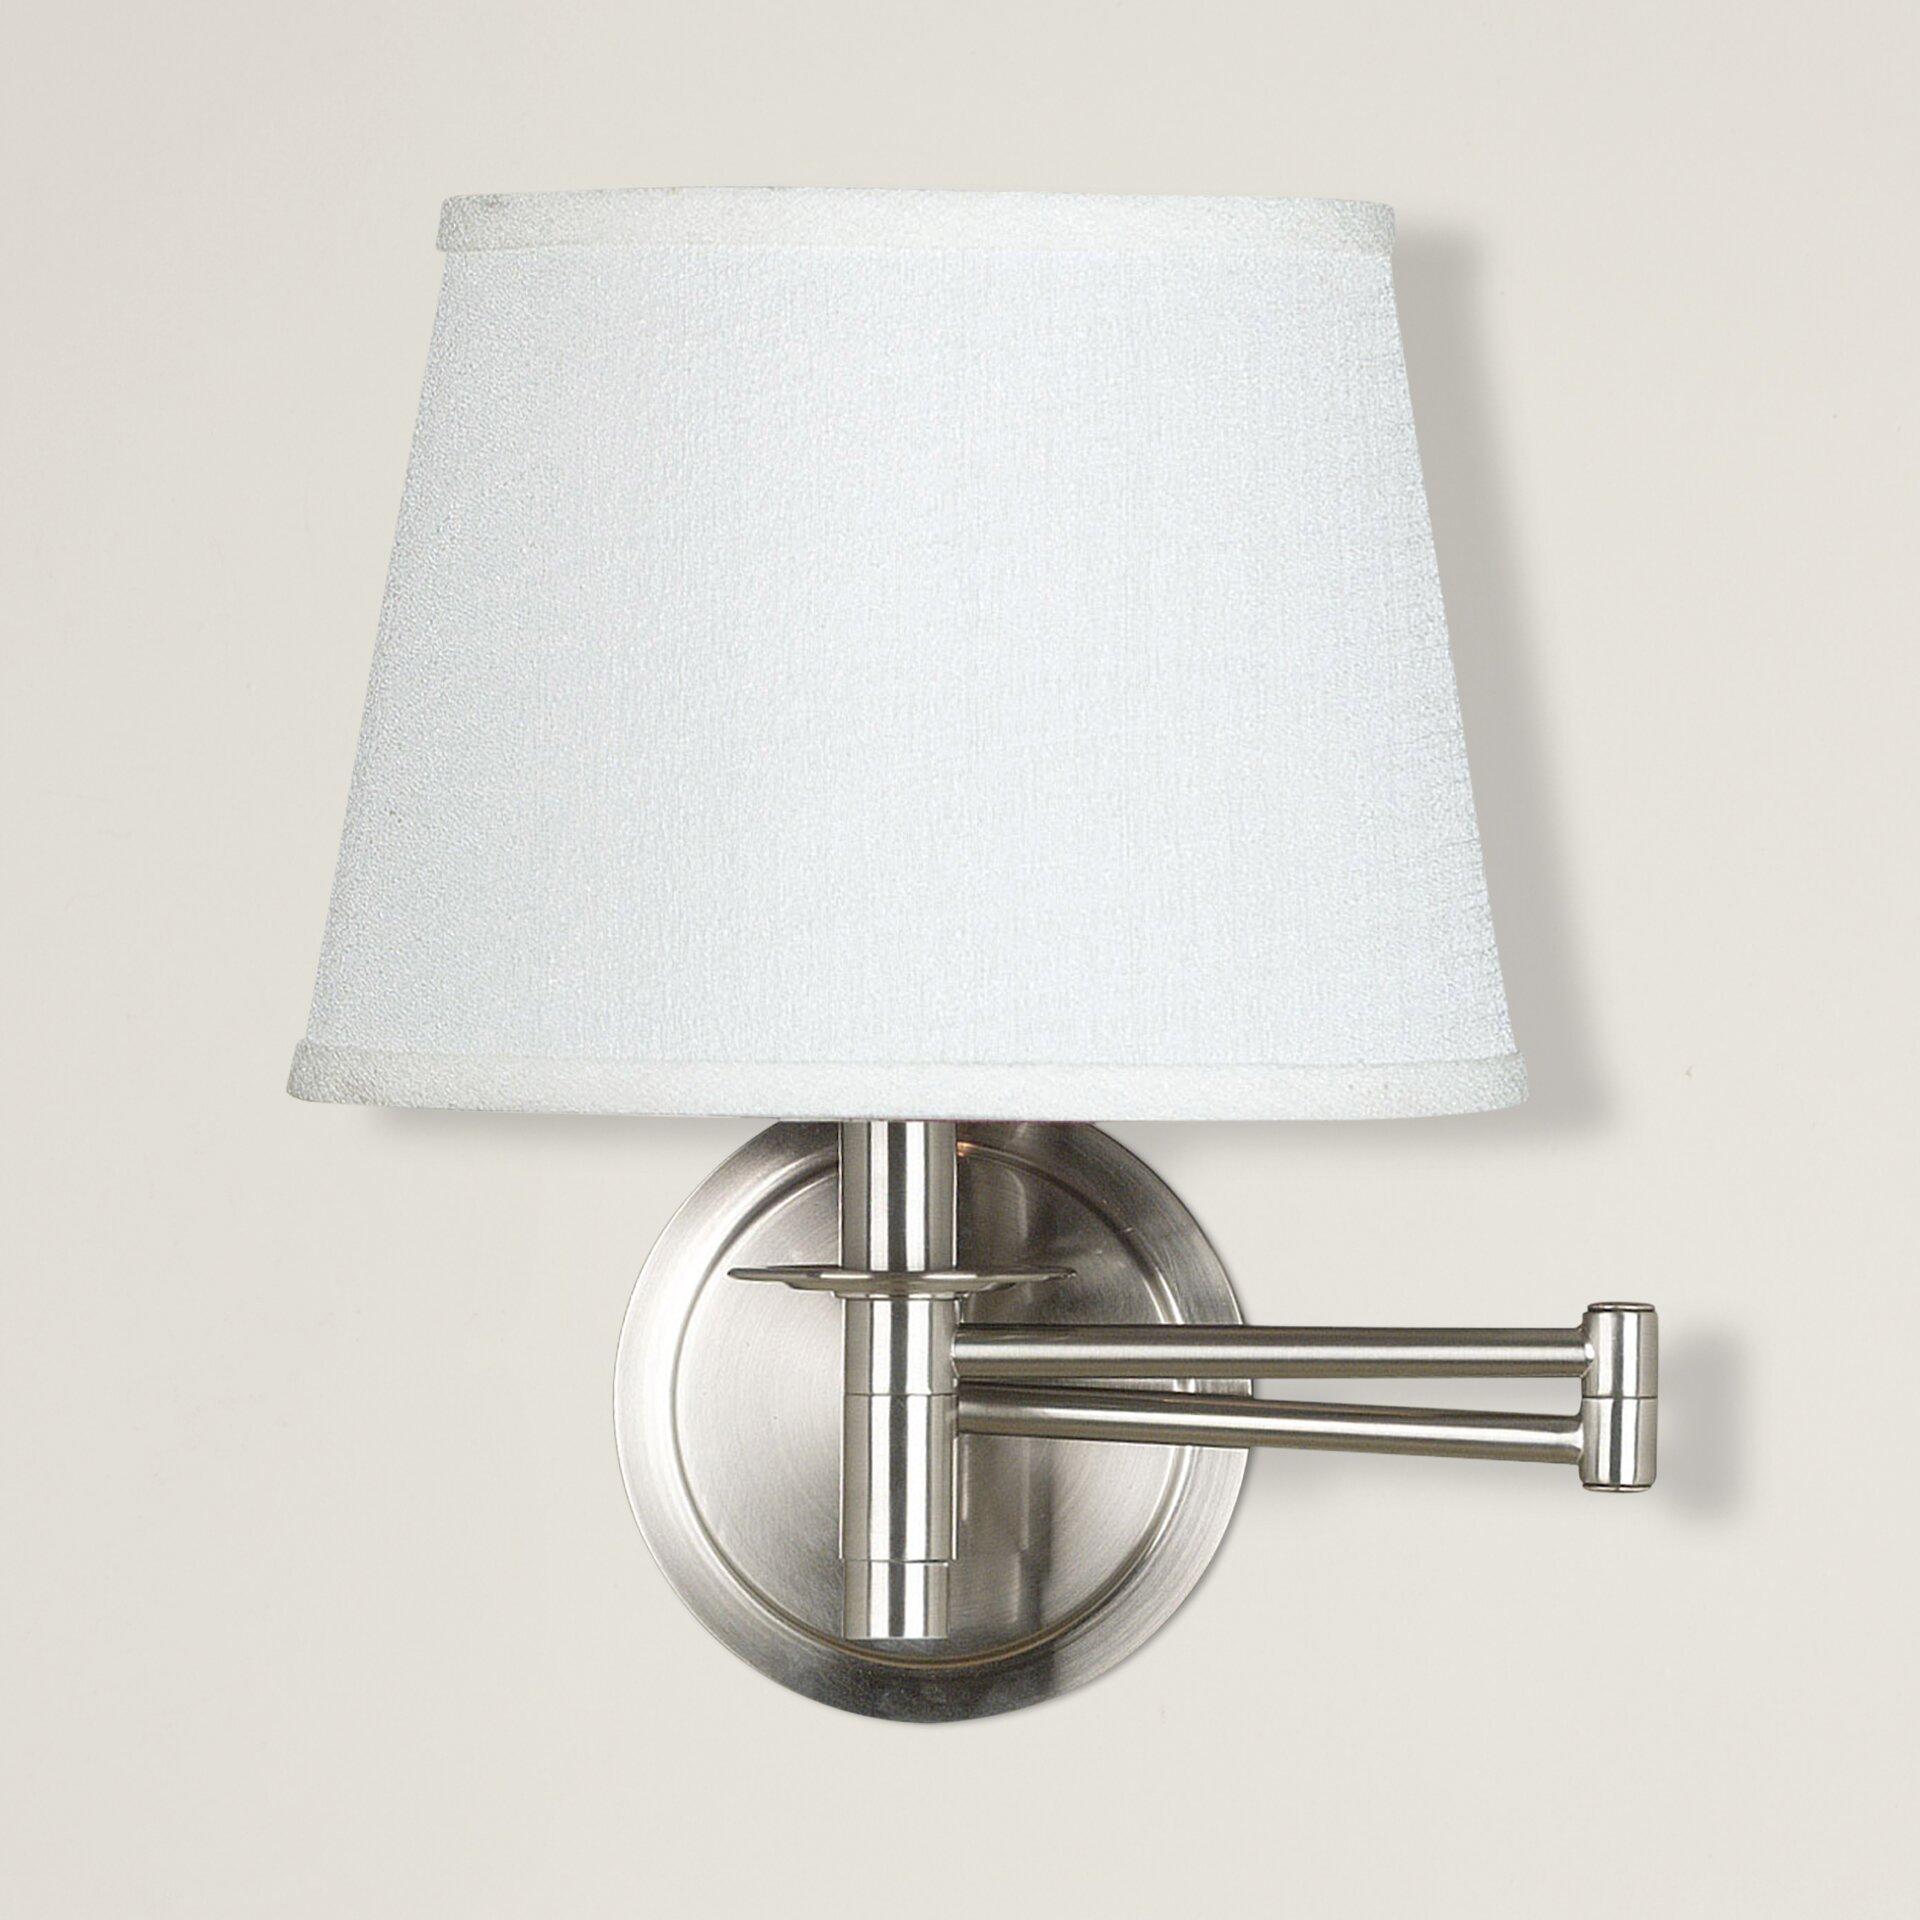 Swing Arm Wall Light Kitchen : Breakwater Bay Eberton 1 Light Swing Arm Wall Lamp & Reviews Wayfair